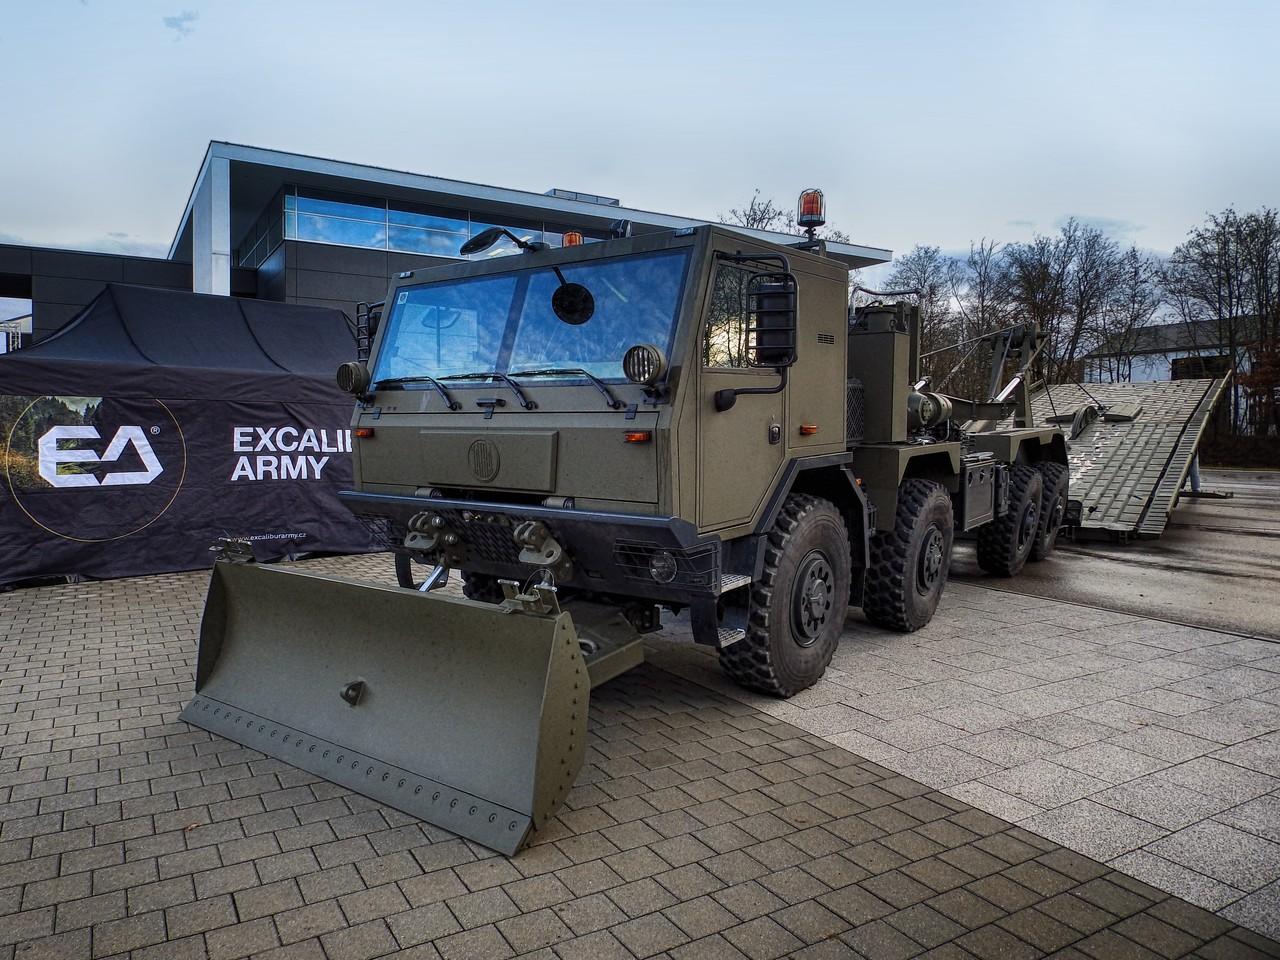 NEW AM-70 EX BRIDGE LAYER GOES PUBLIC | Excalibur Army